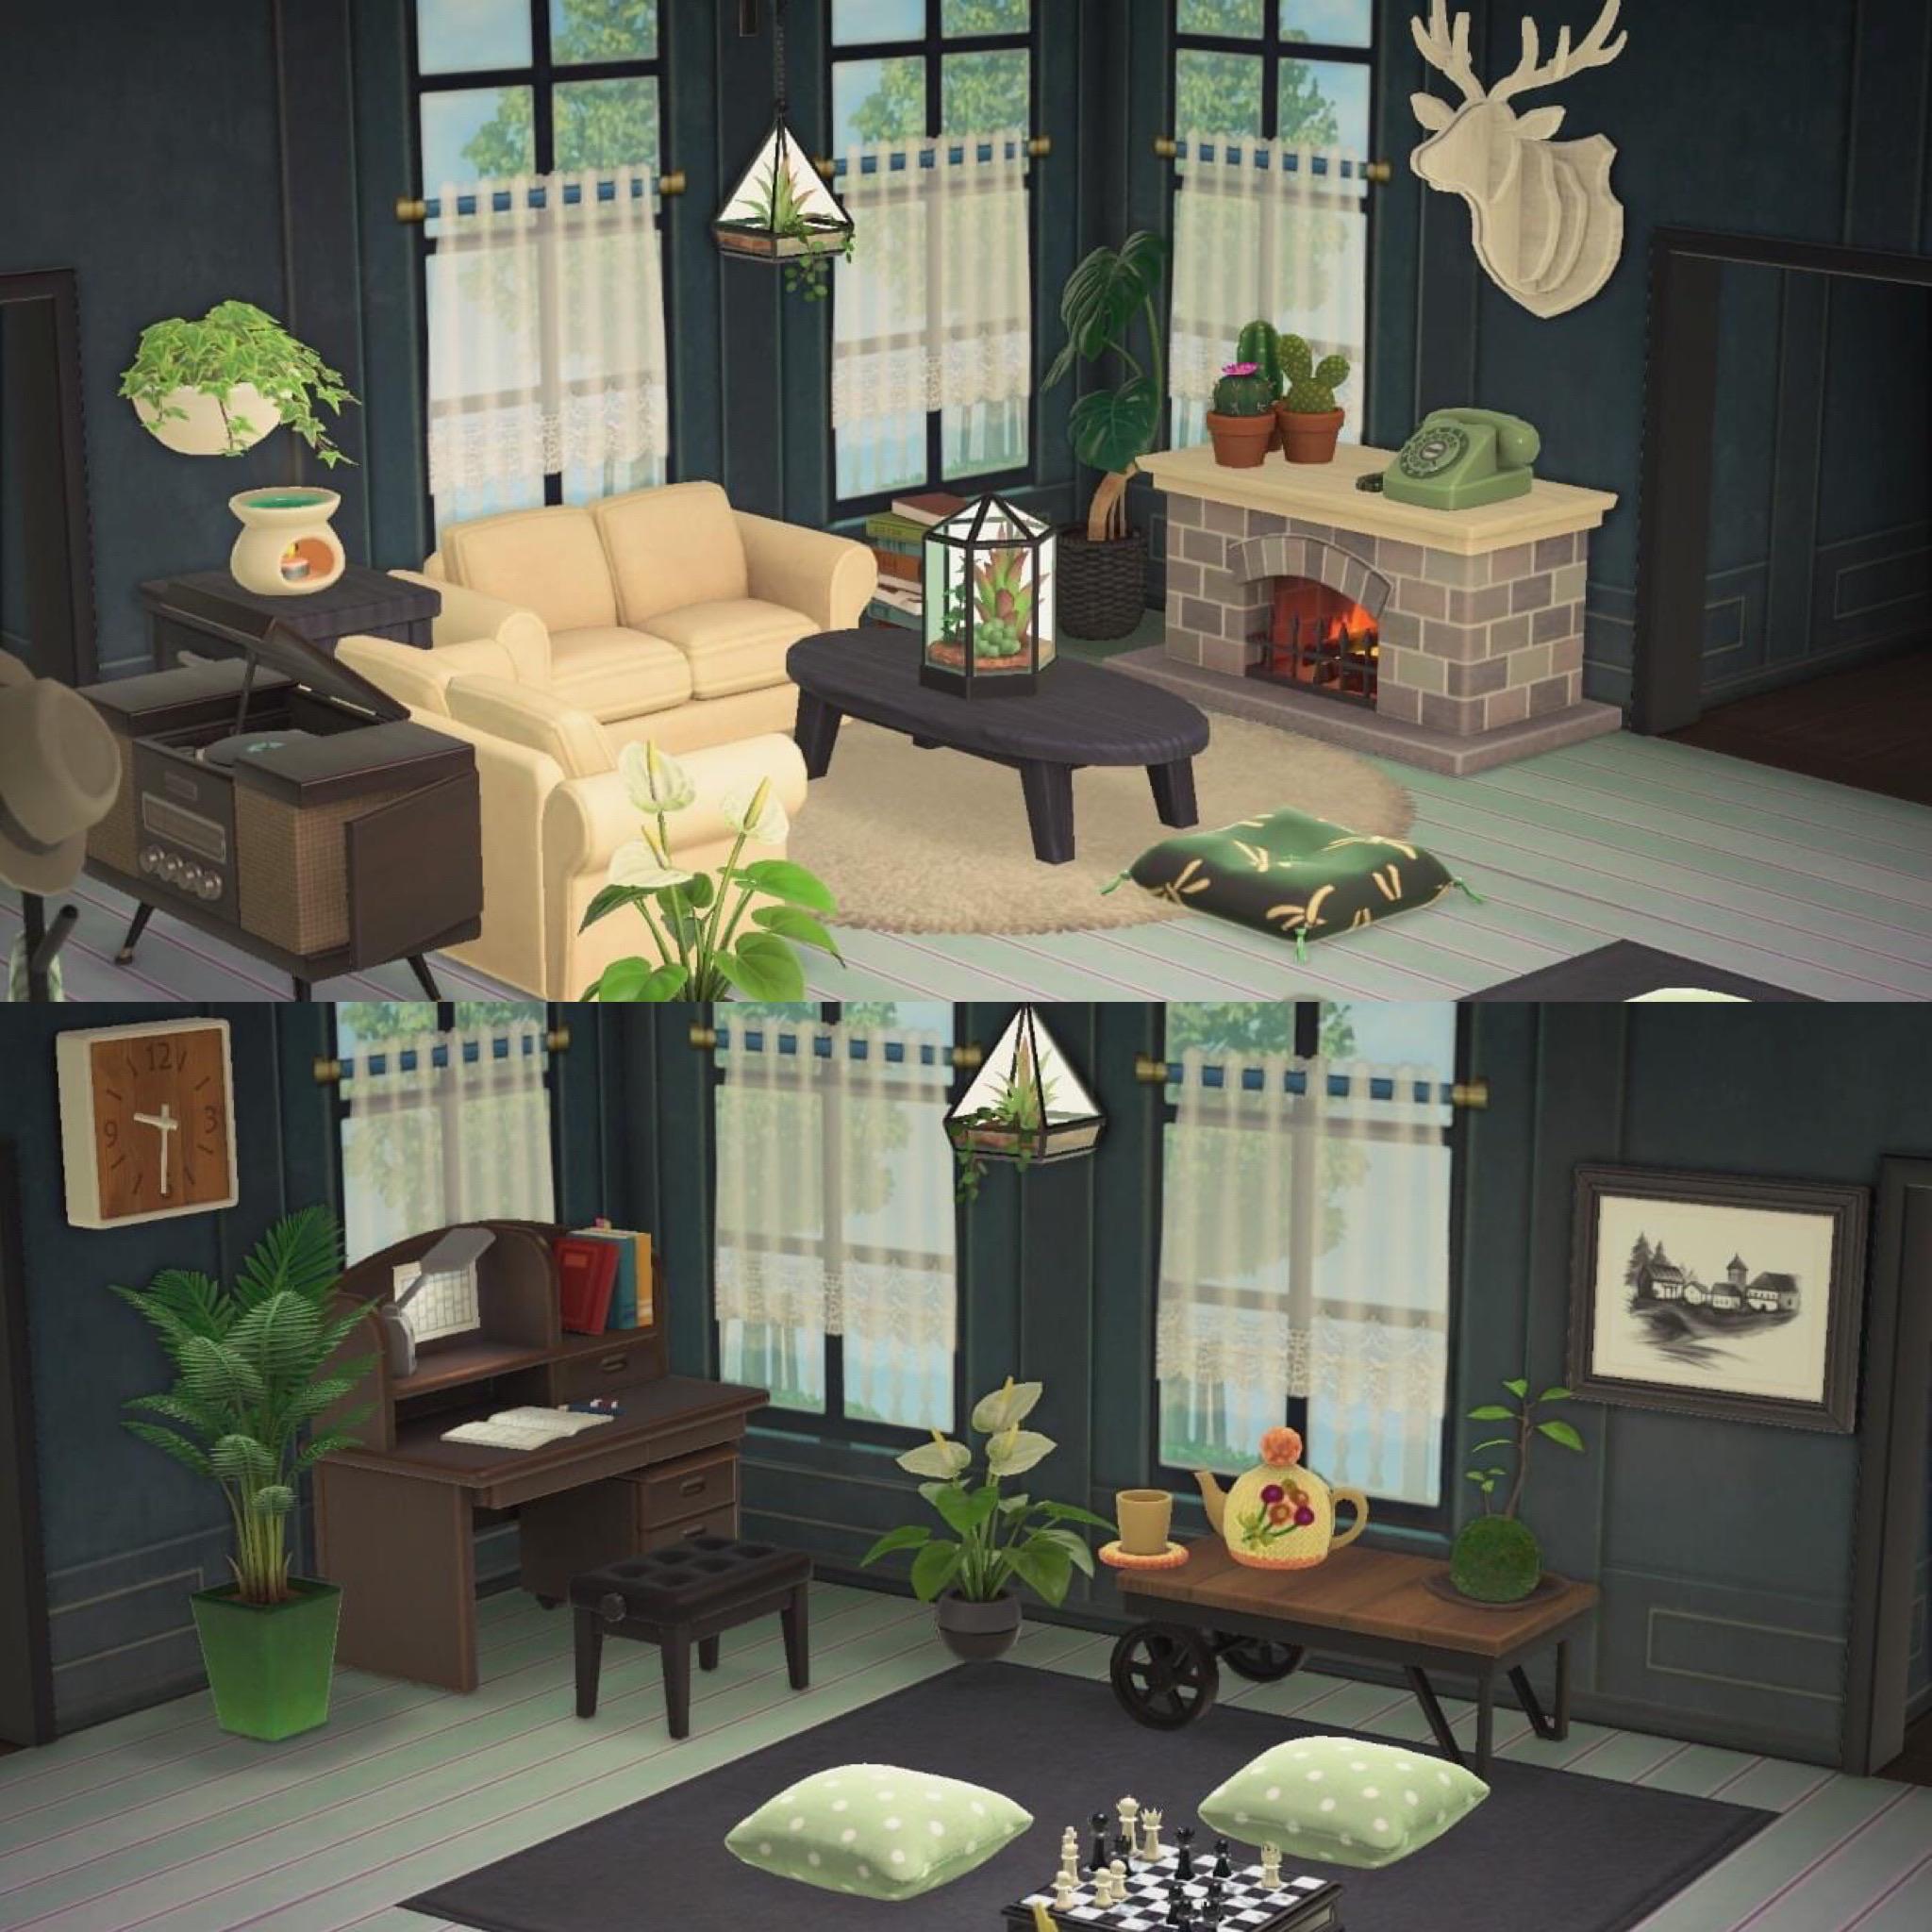 Love my new living room!! : AnimalCrossing on New Horizons Living Room  id=26262